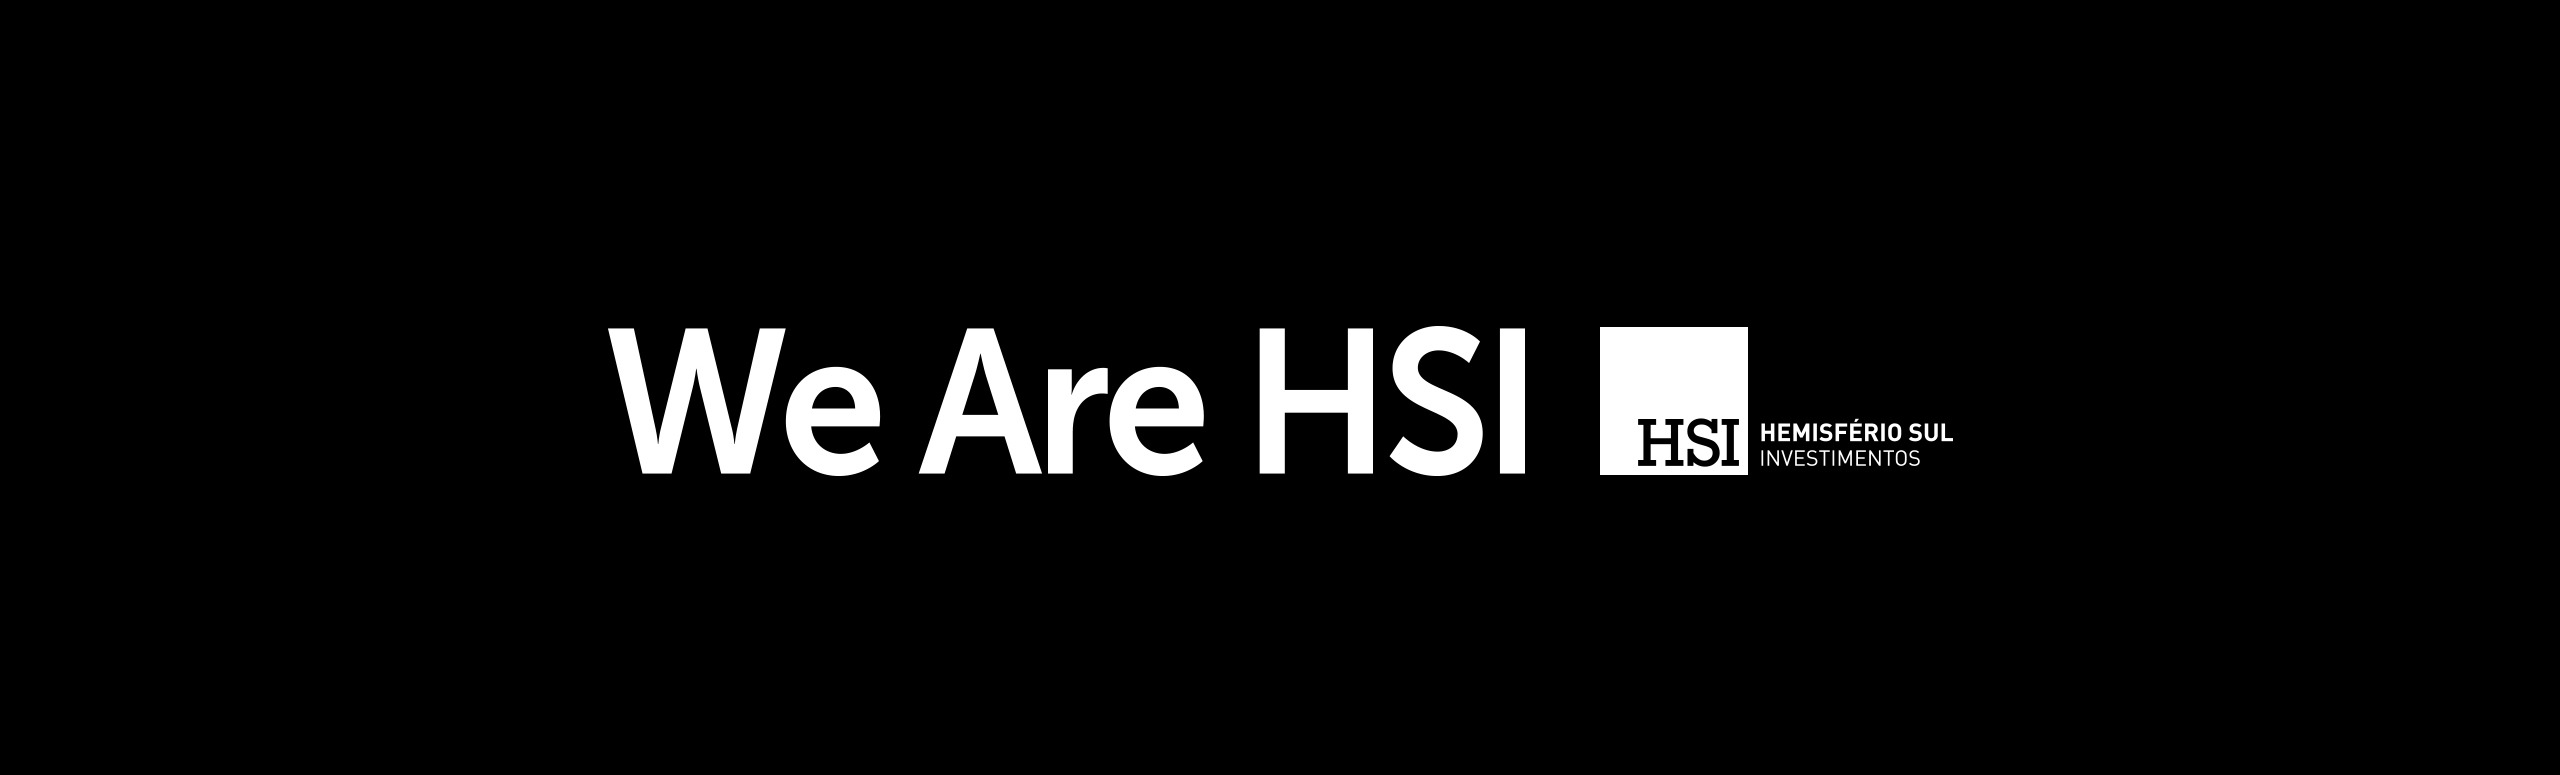 HSI | HEMISFÉRIO SUL INVESTIMENTOS